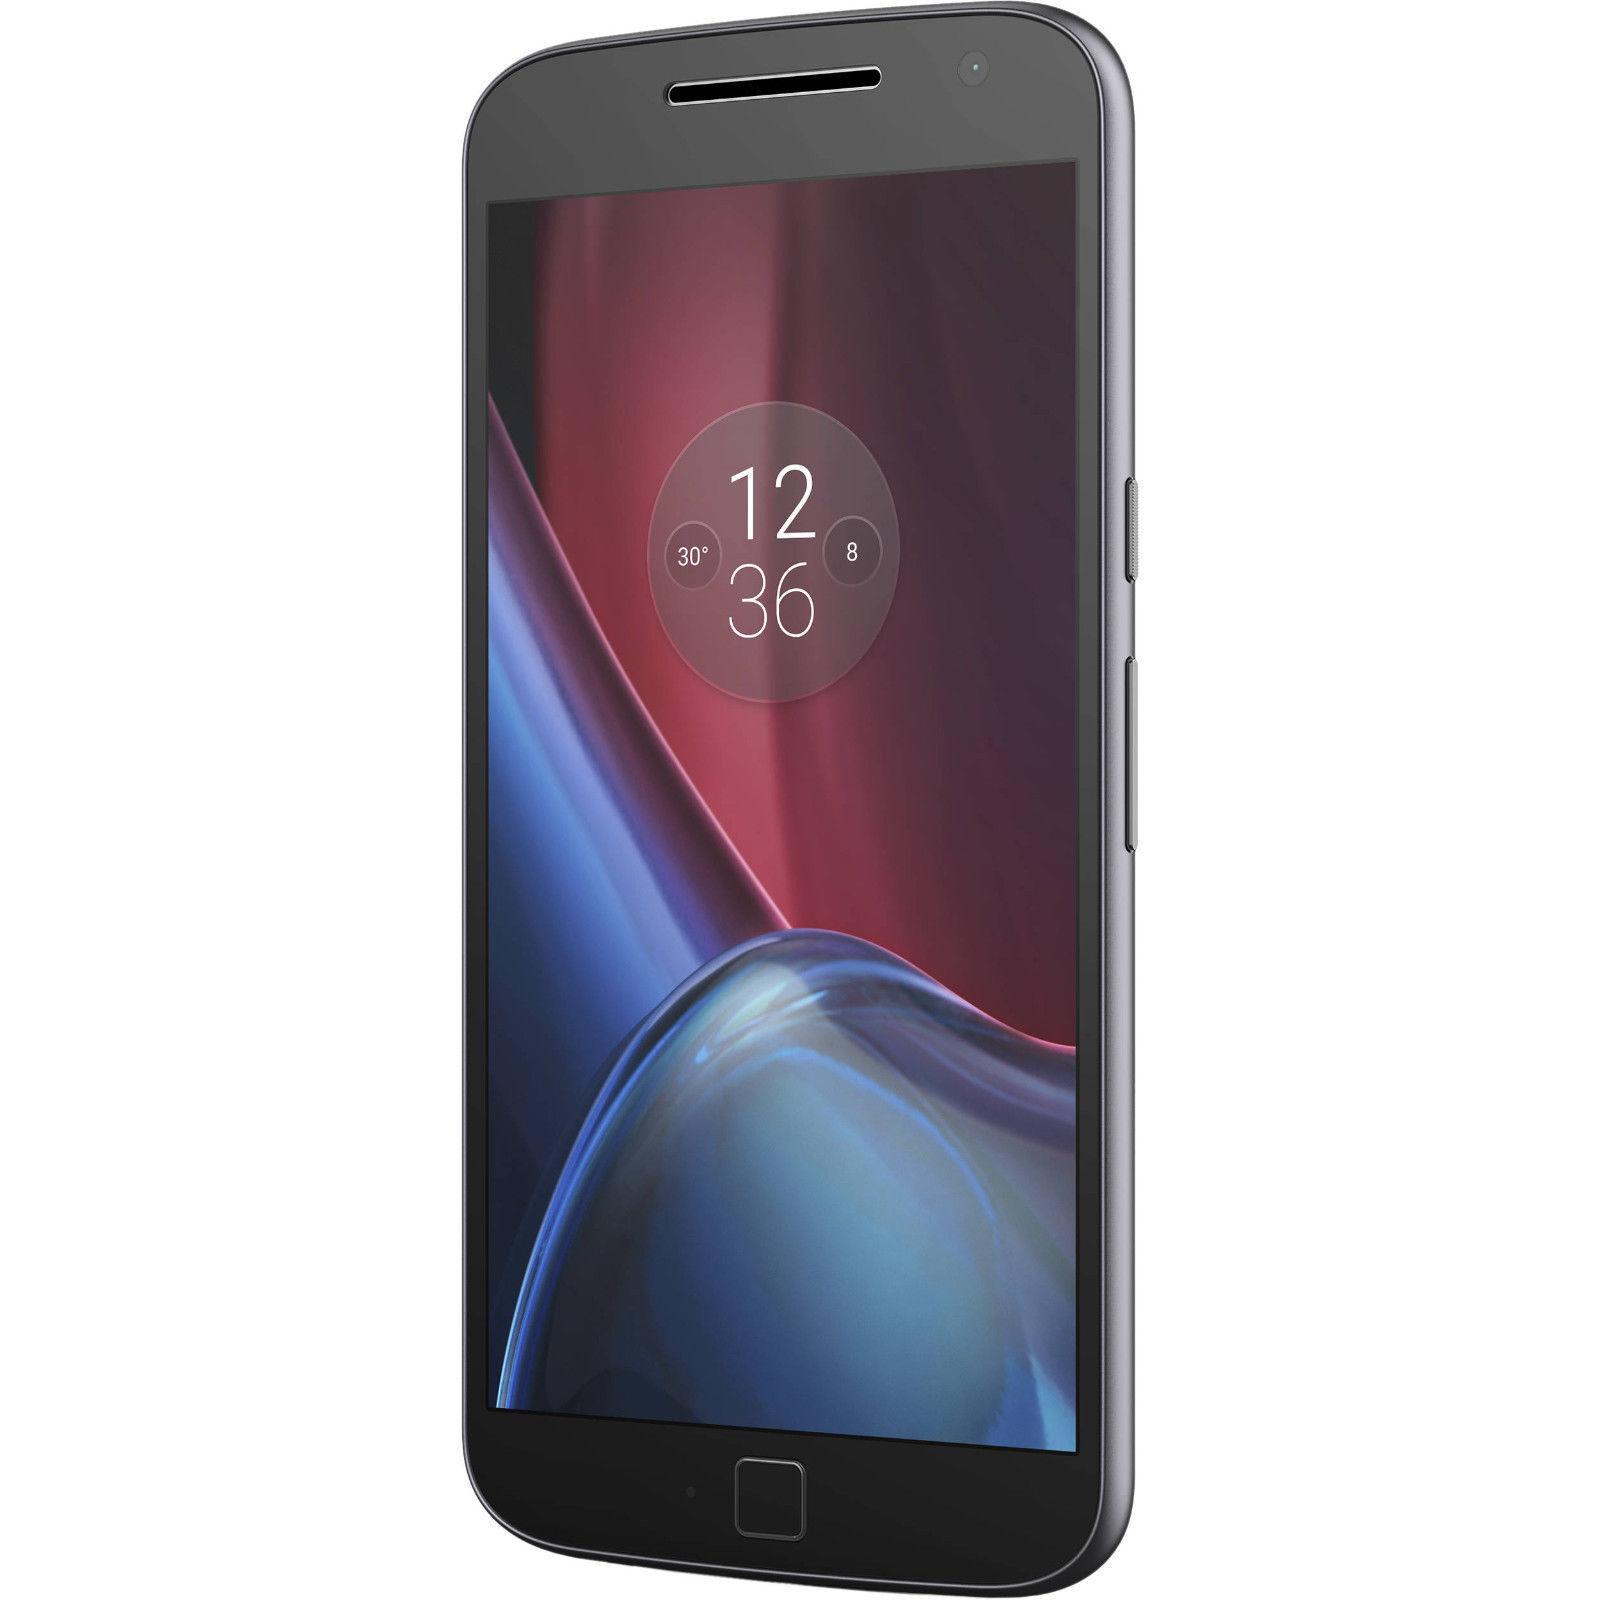 Motorola Moto G Plus 4th Generation XT1644 - 64GB - Black (Unlocked) Smartphone